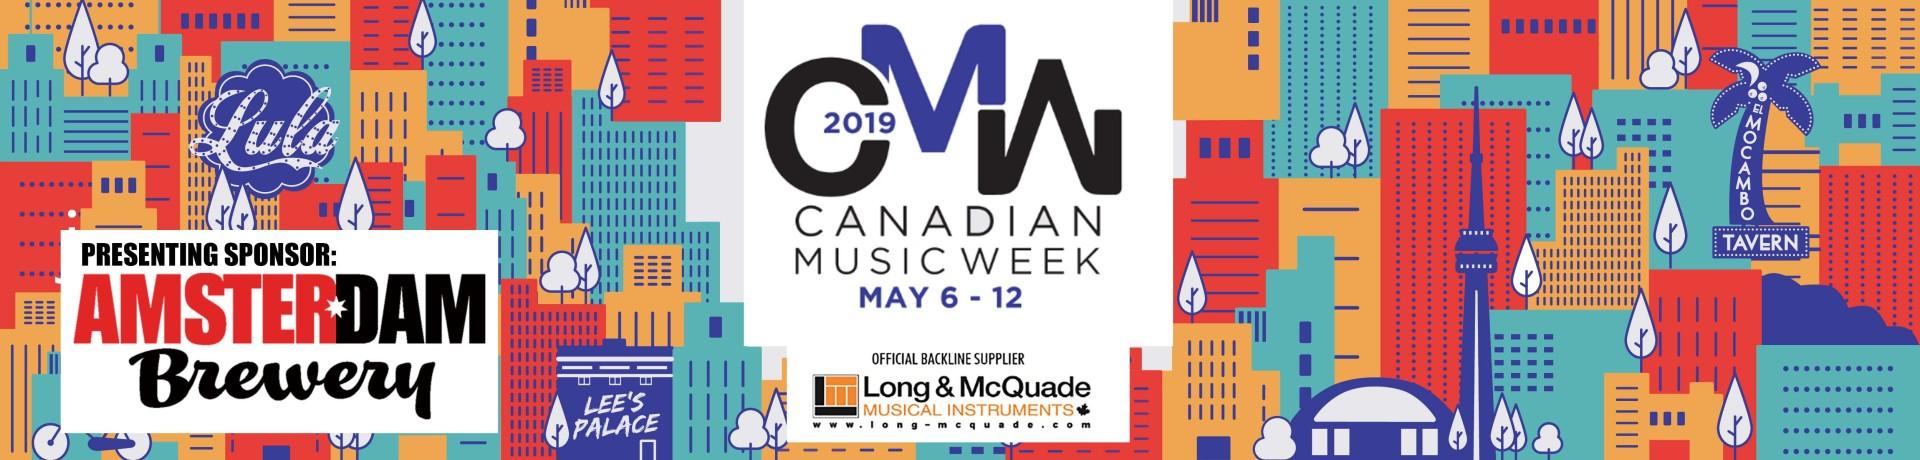 CMW 2019 festival header